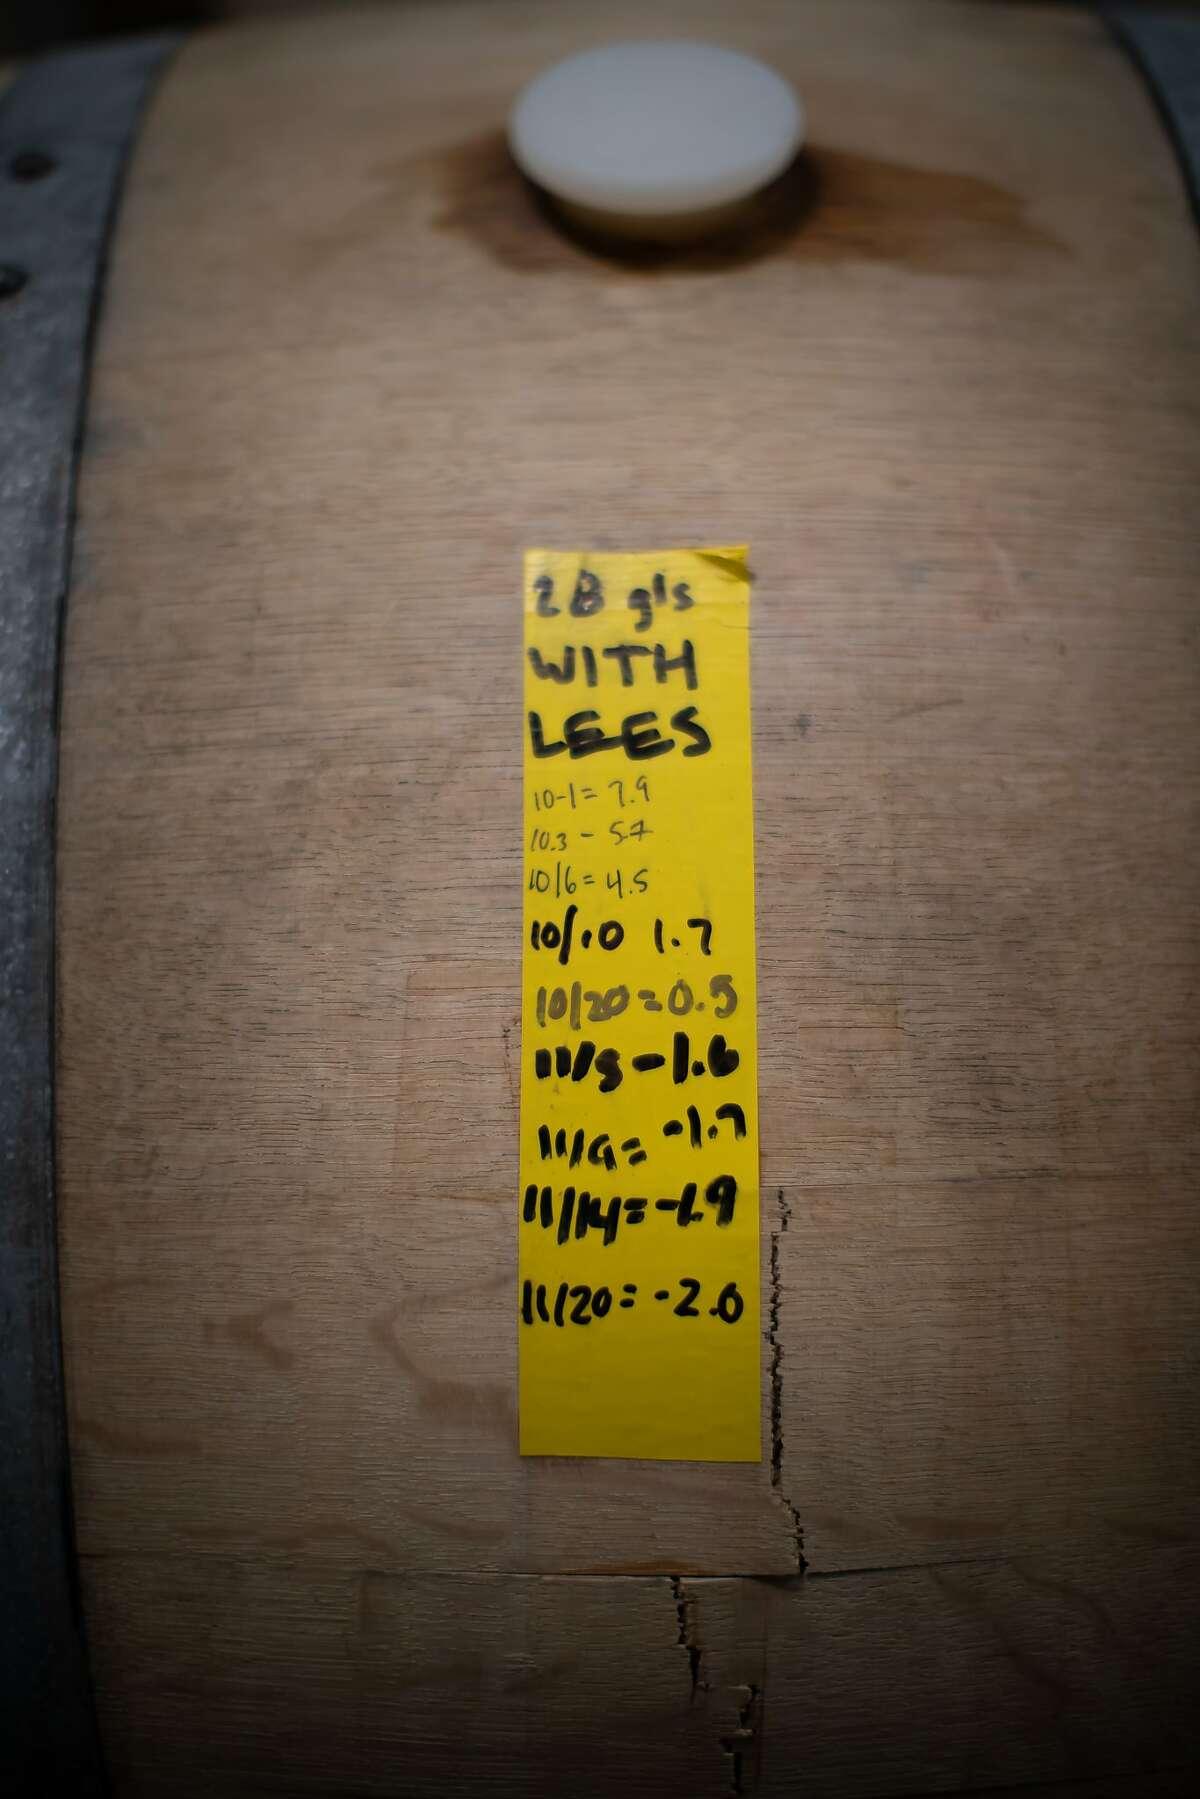 A log sheet taped to a wine barrel at Grand Cru Custom Crush, on Saturday, Jan. 12, 2019, in Healdsburg, Calif.